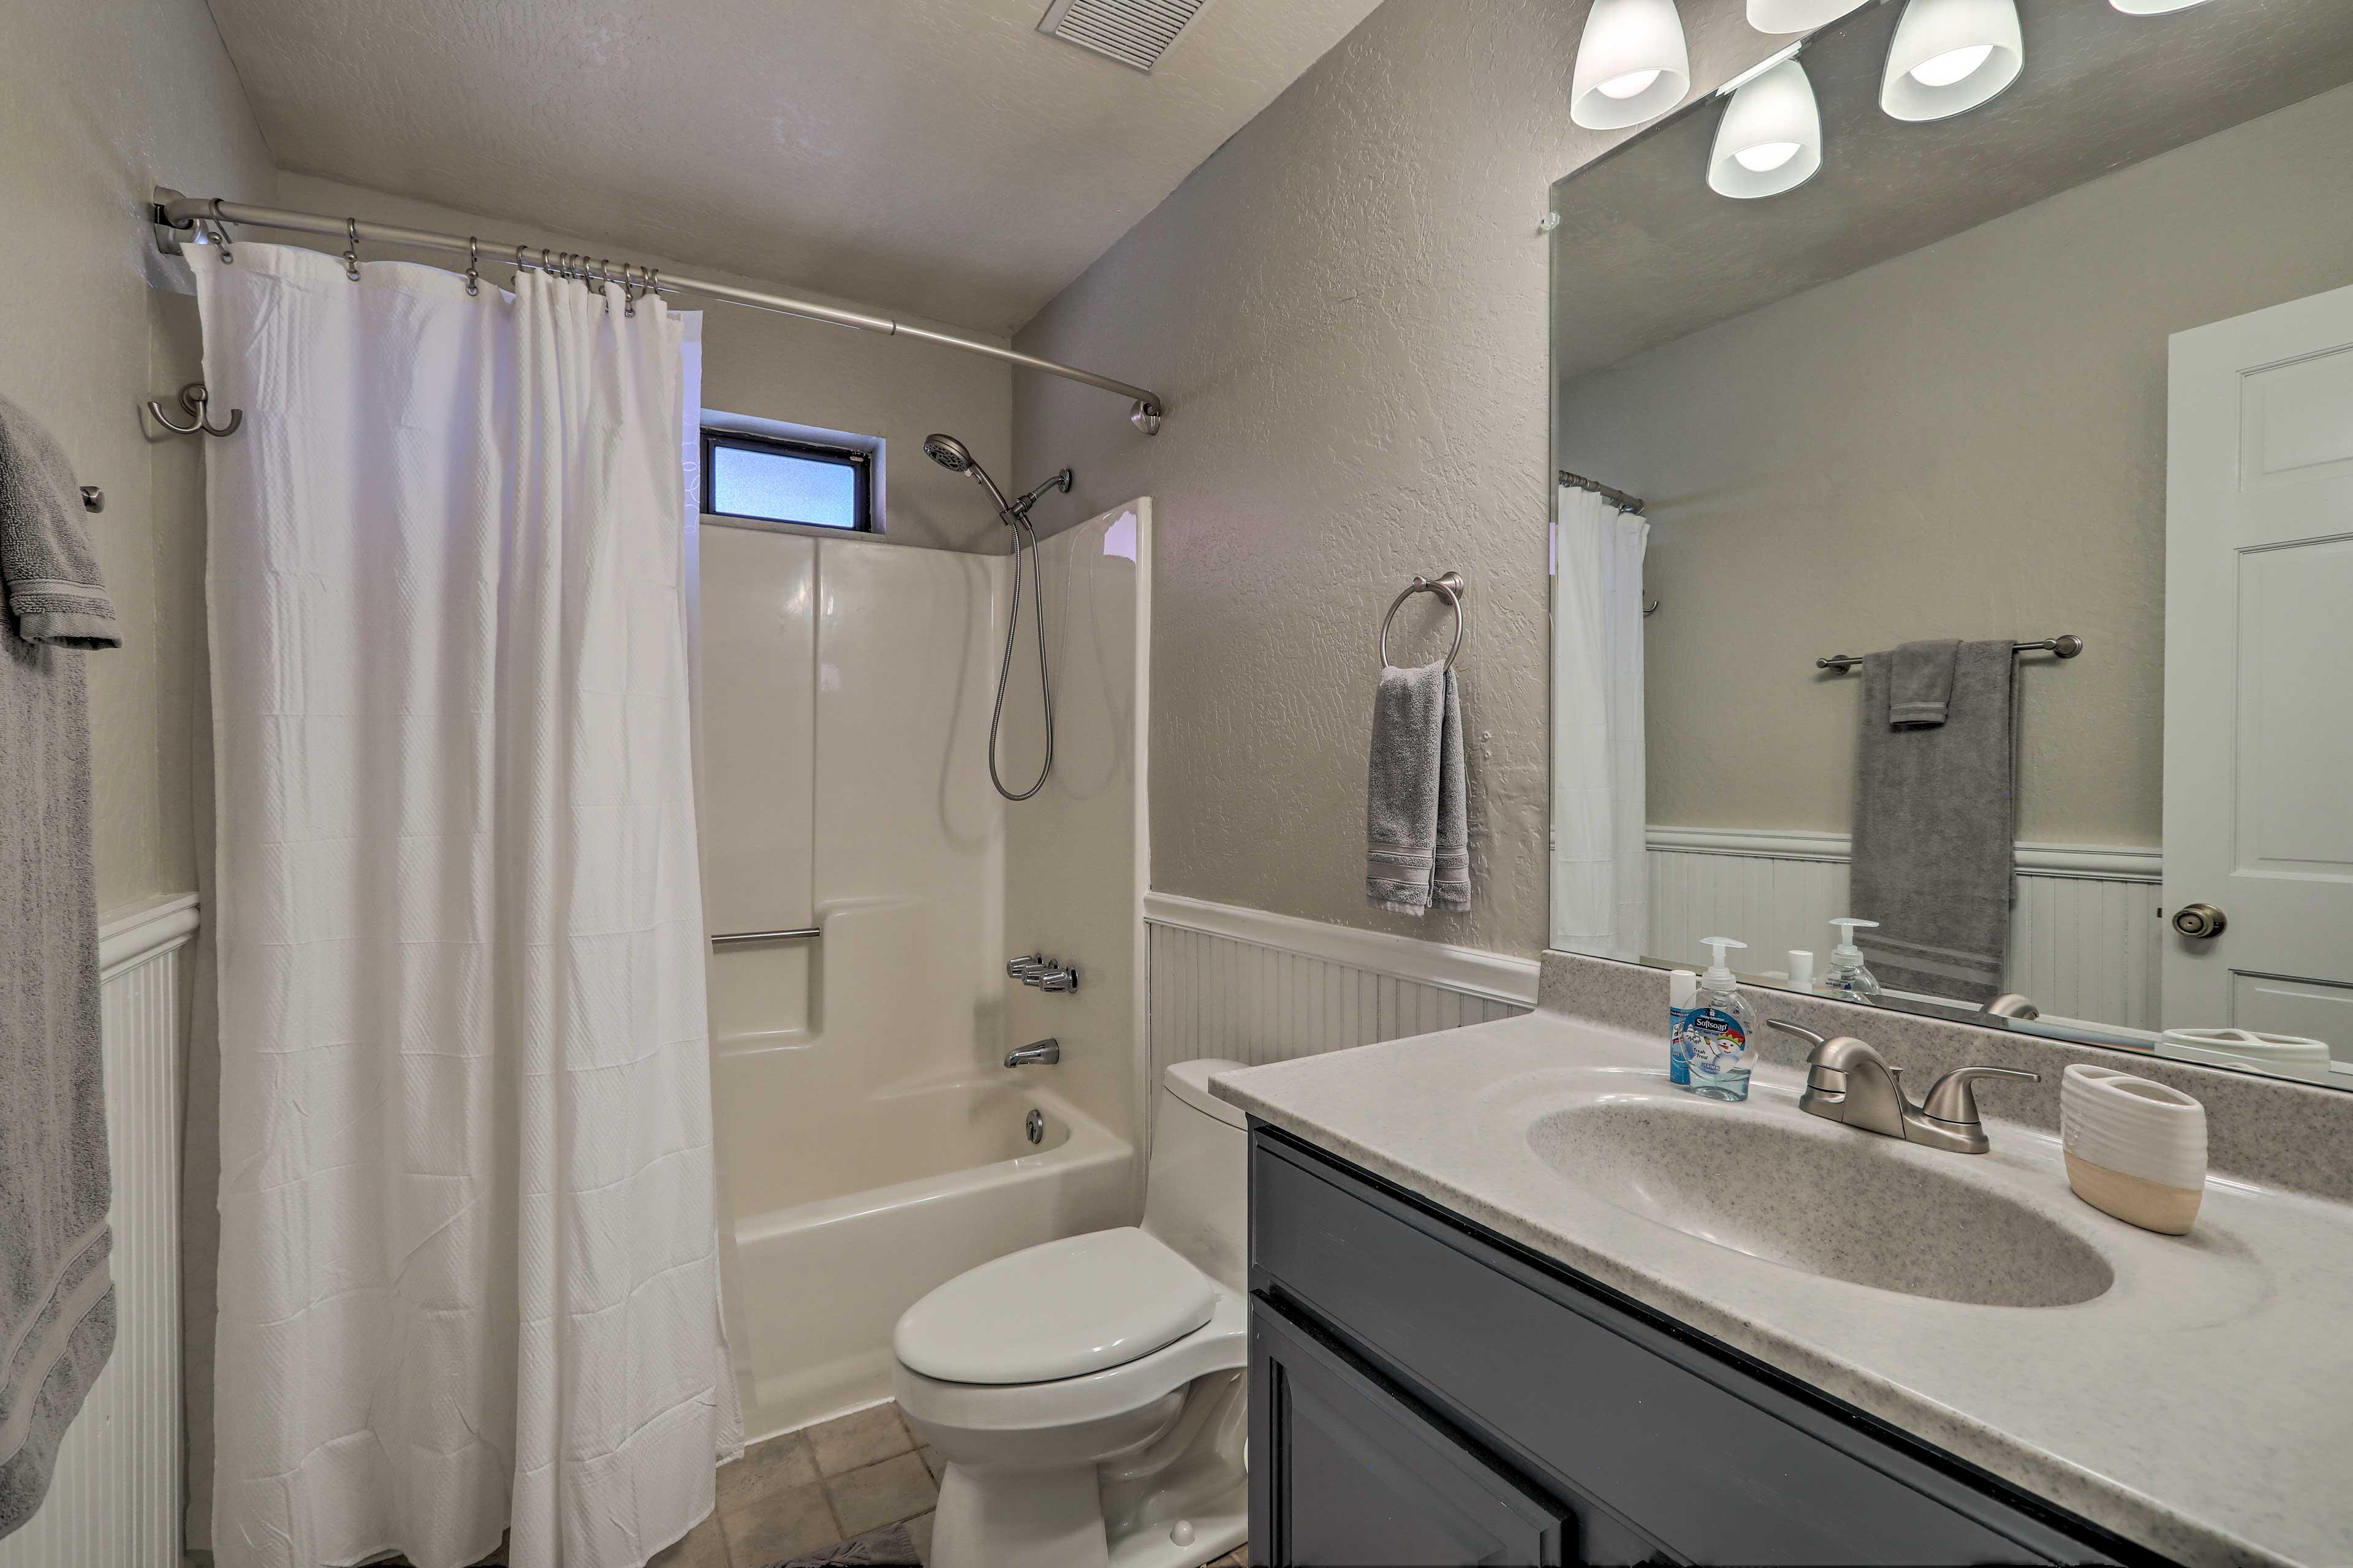 A third full bathroom has a shower/tub combo.